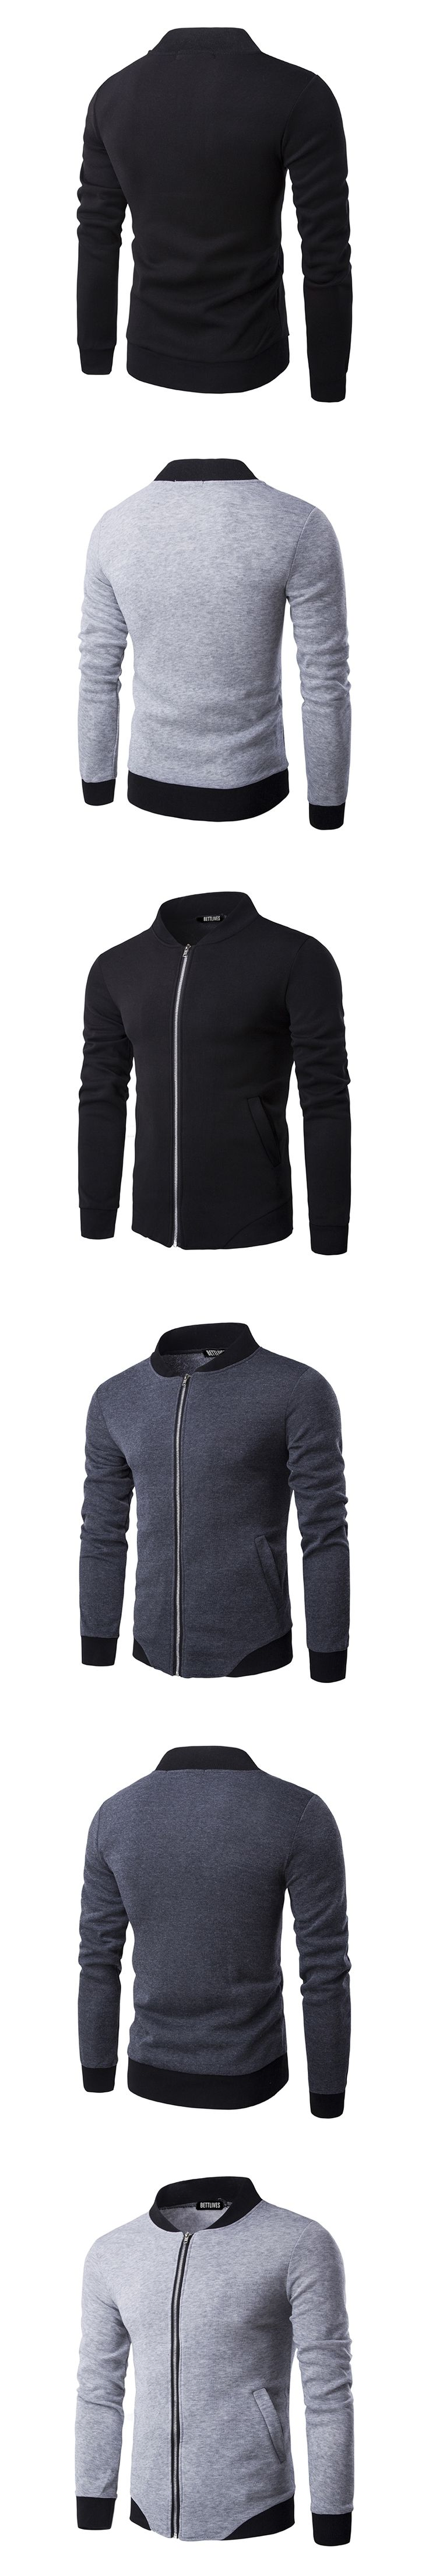 Fashion Men's College Jacket Stand Collar Cotton Zipper Coat Male Casual Long Sleeve Baseball Varisty Mens Jacket Slim Fit B3156